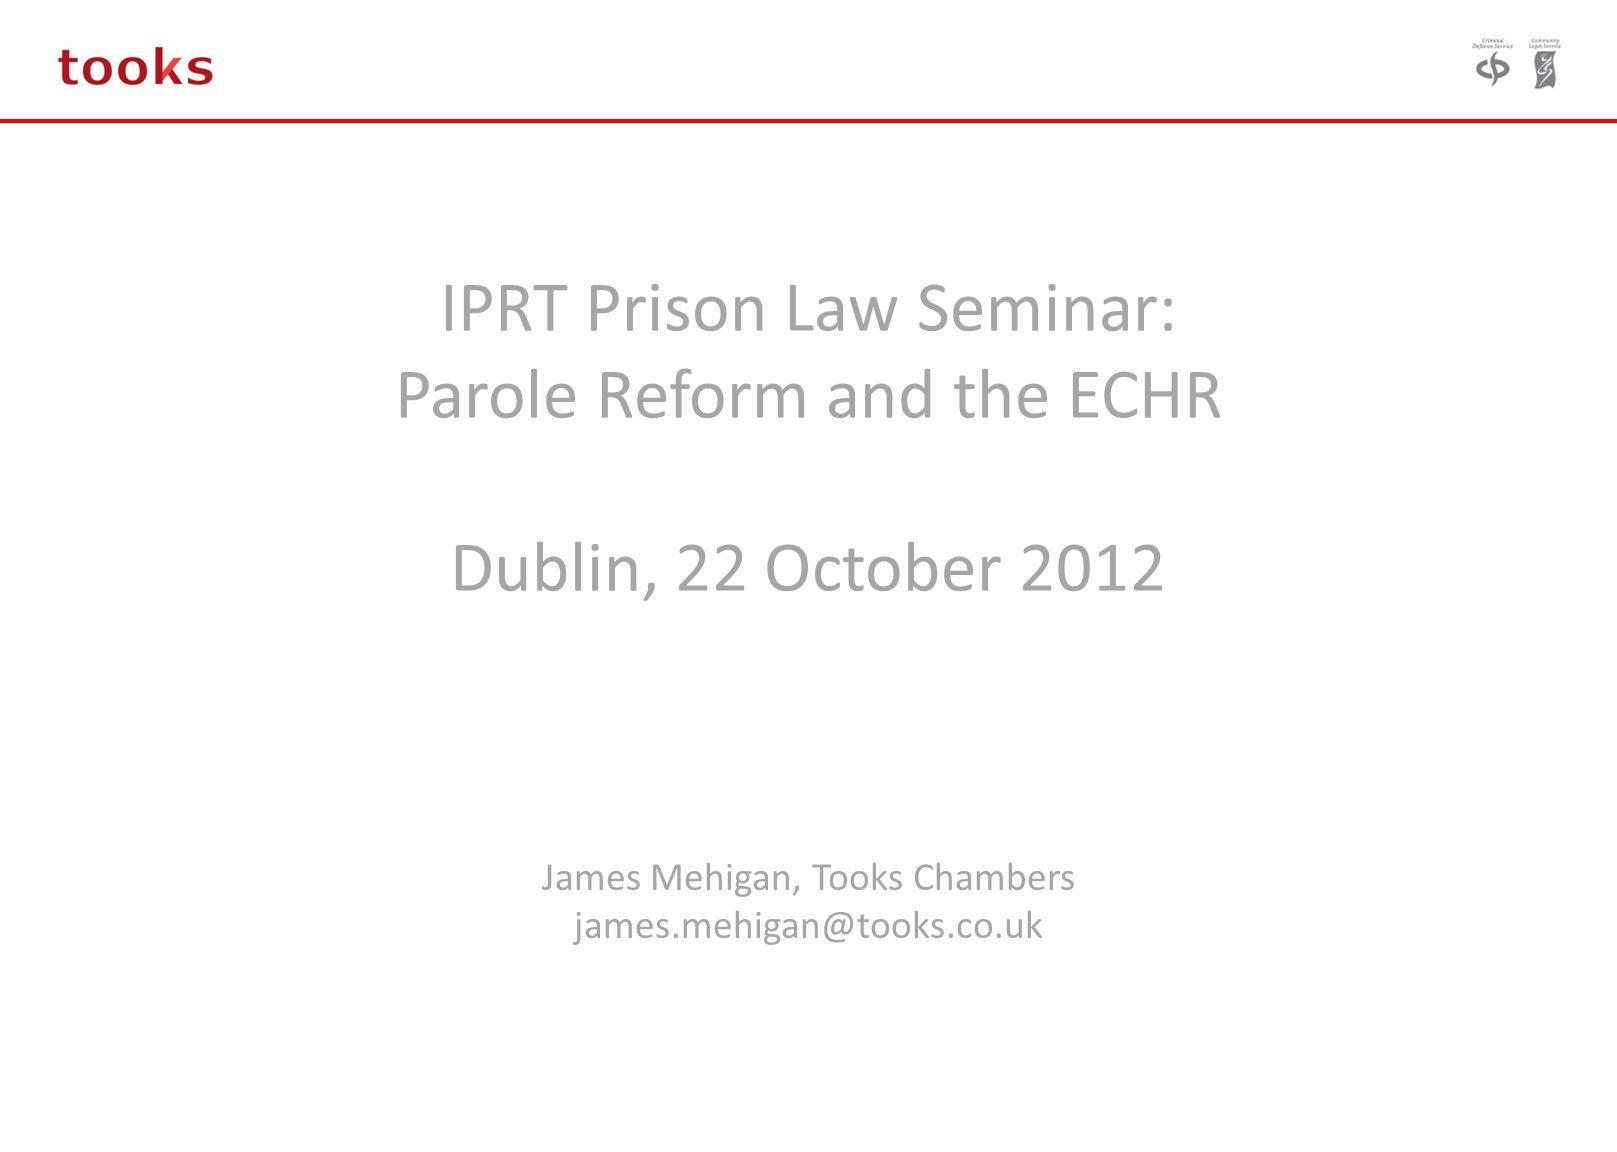 IPRT Prison Law Seminar: Parole Reform and the ECHR Dublin, 22 October 2012 James Mehigan, Tooks Chambers james.mehigan@tooks.co.uk